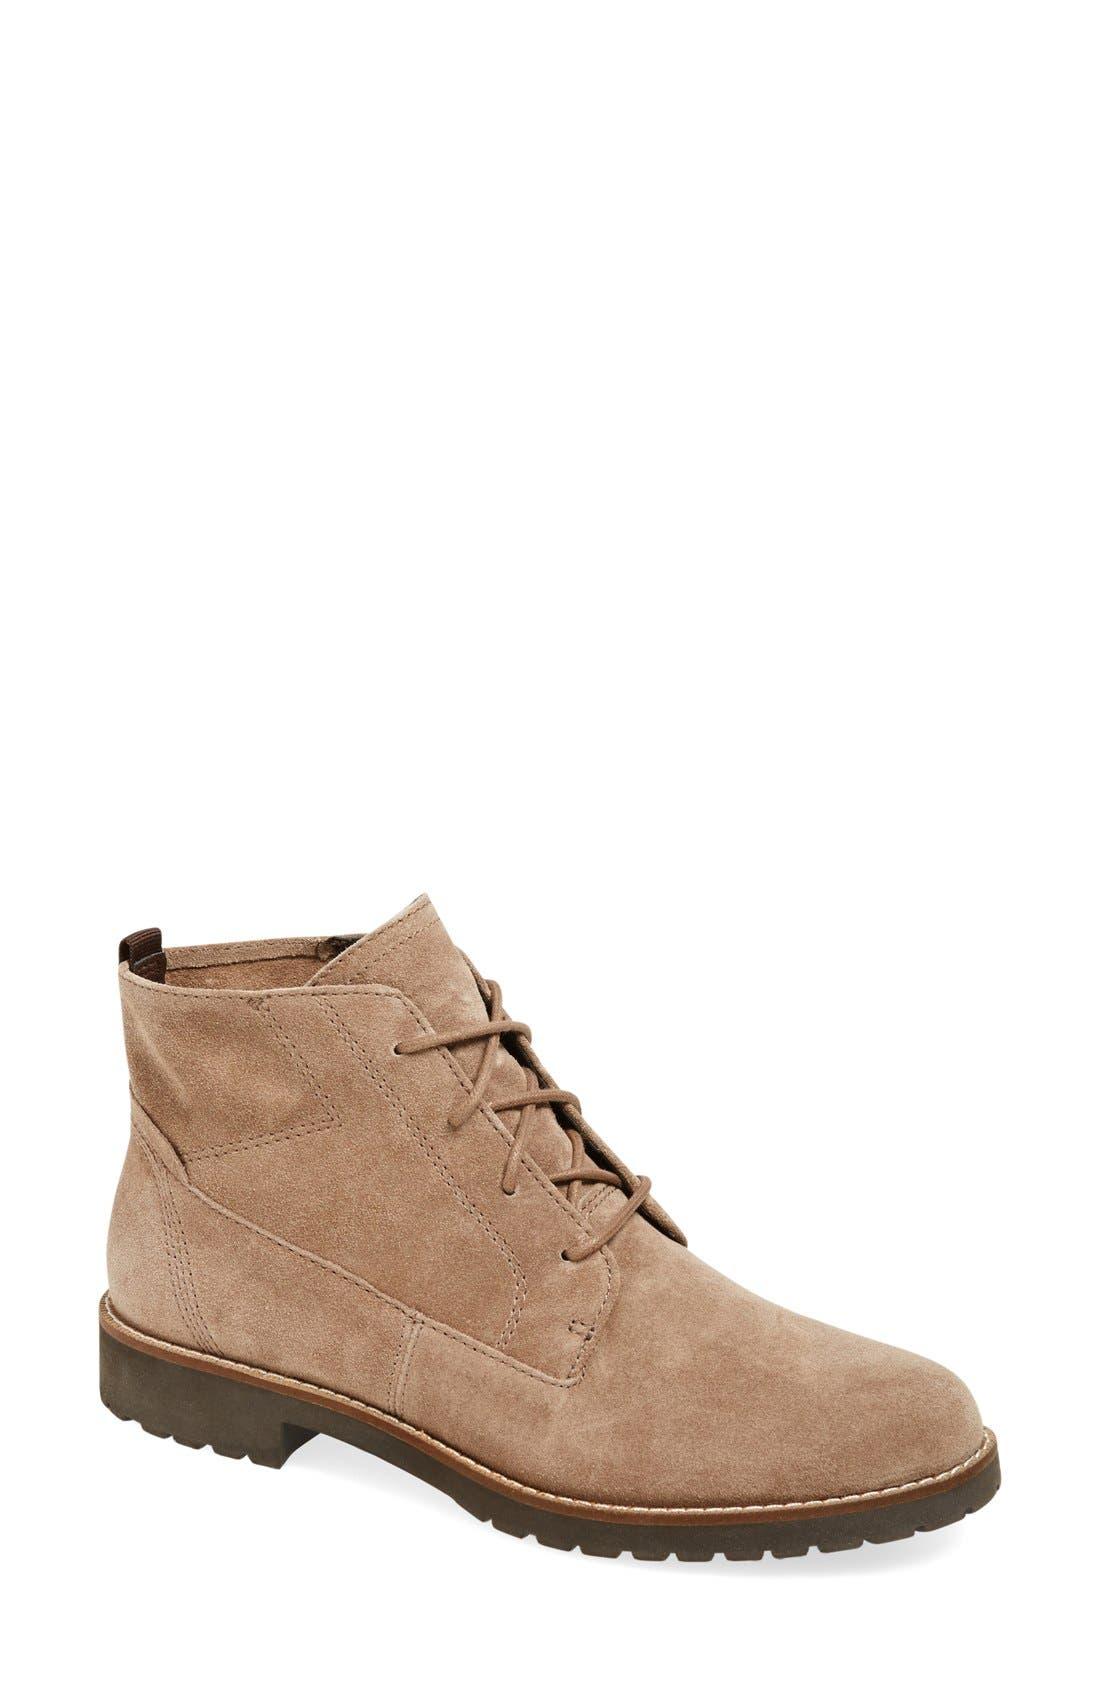 Alternate Image 1 Selected - Franco Sarto 'Civic' Boot (Women)